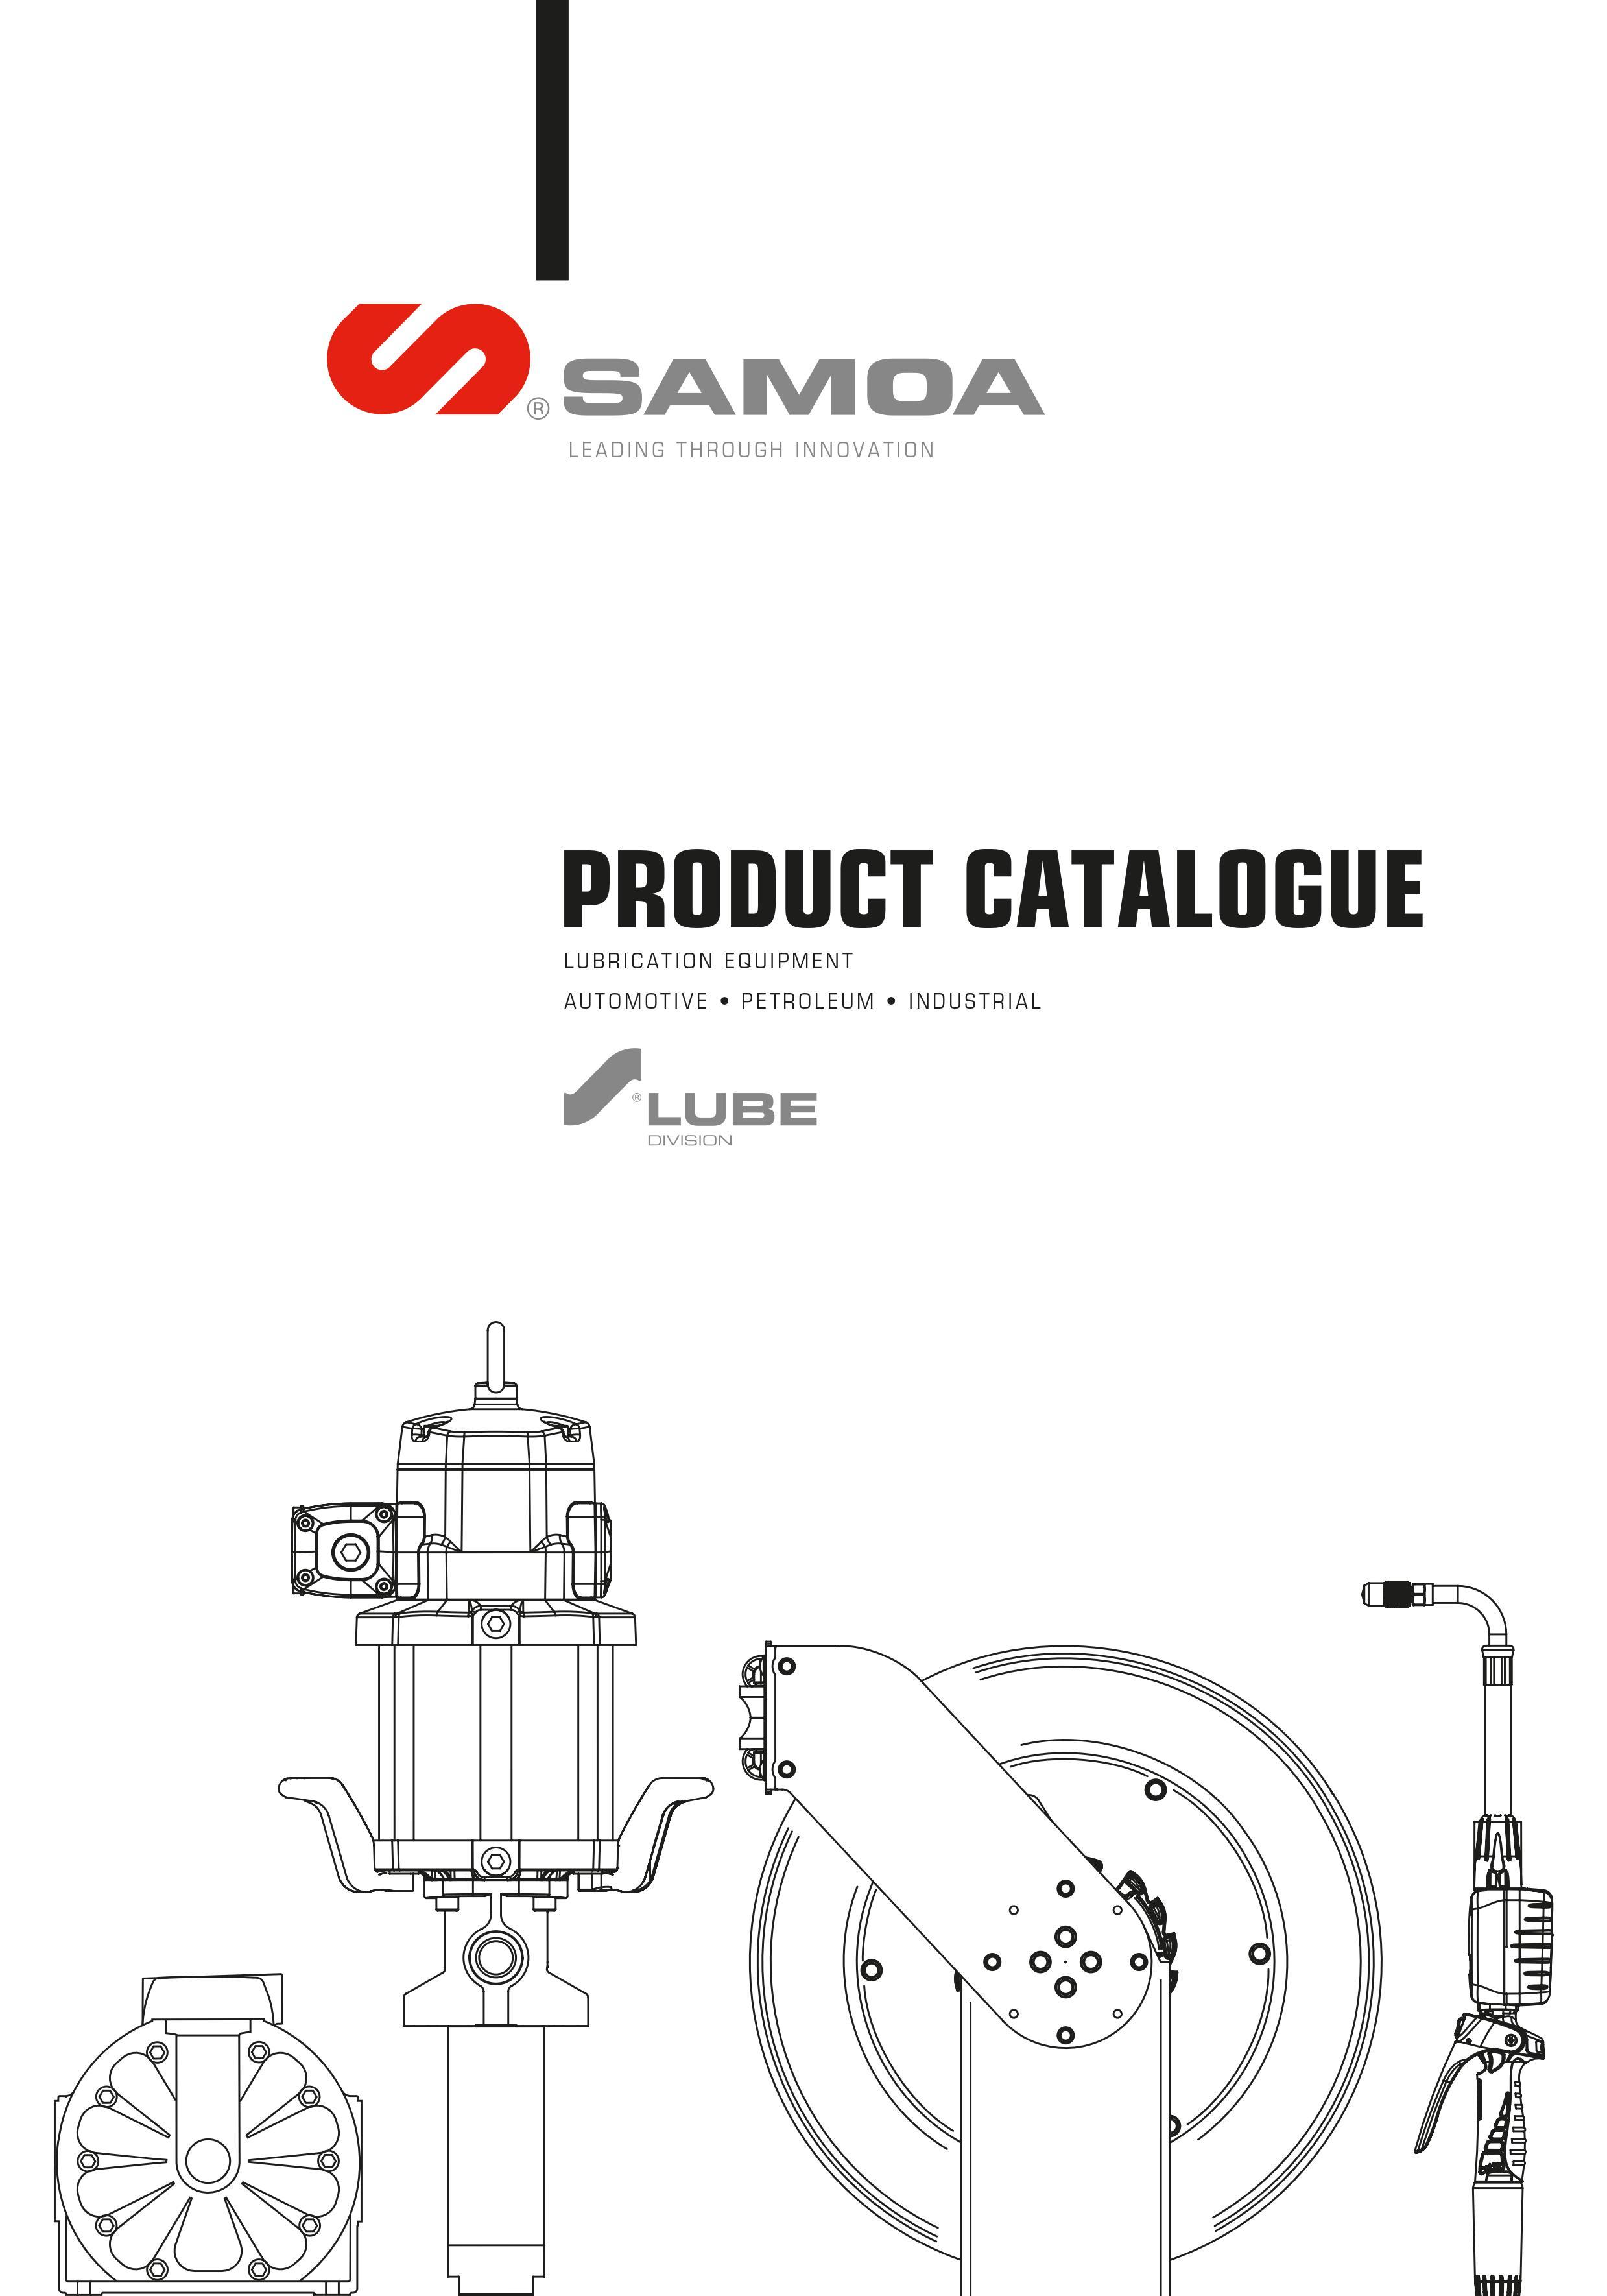 SAMOA Product Catalogue